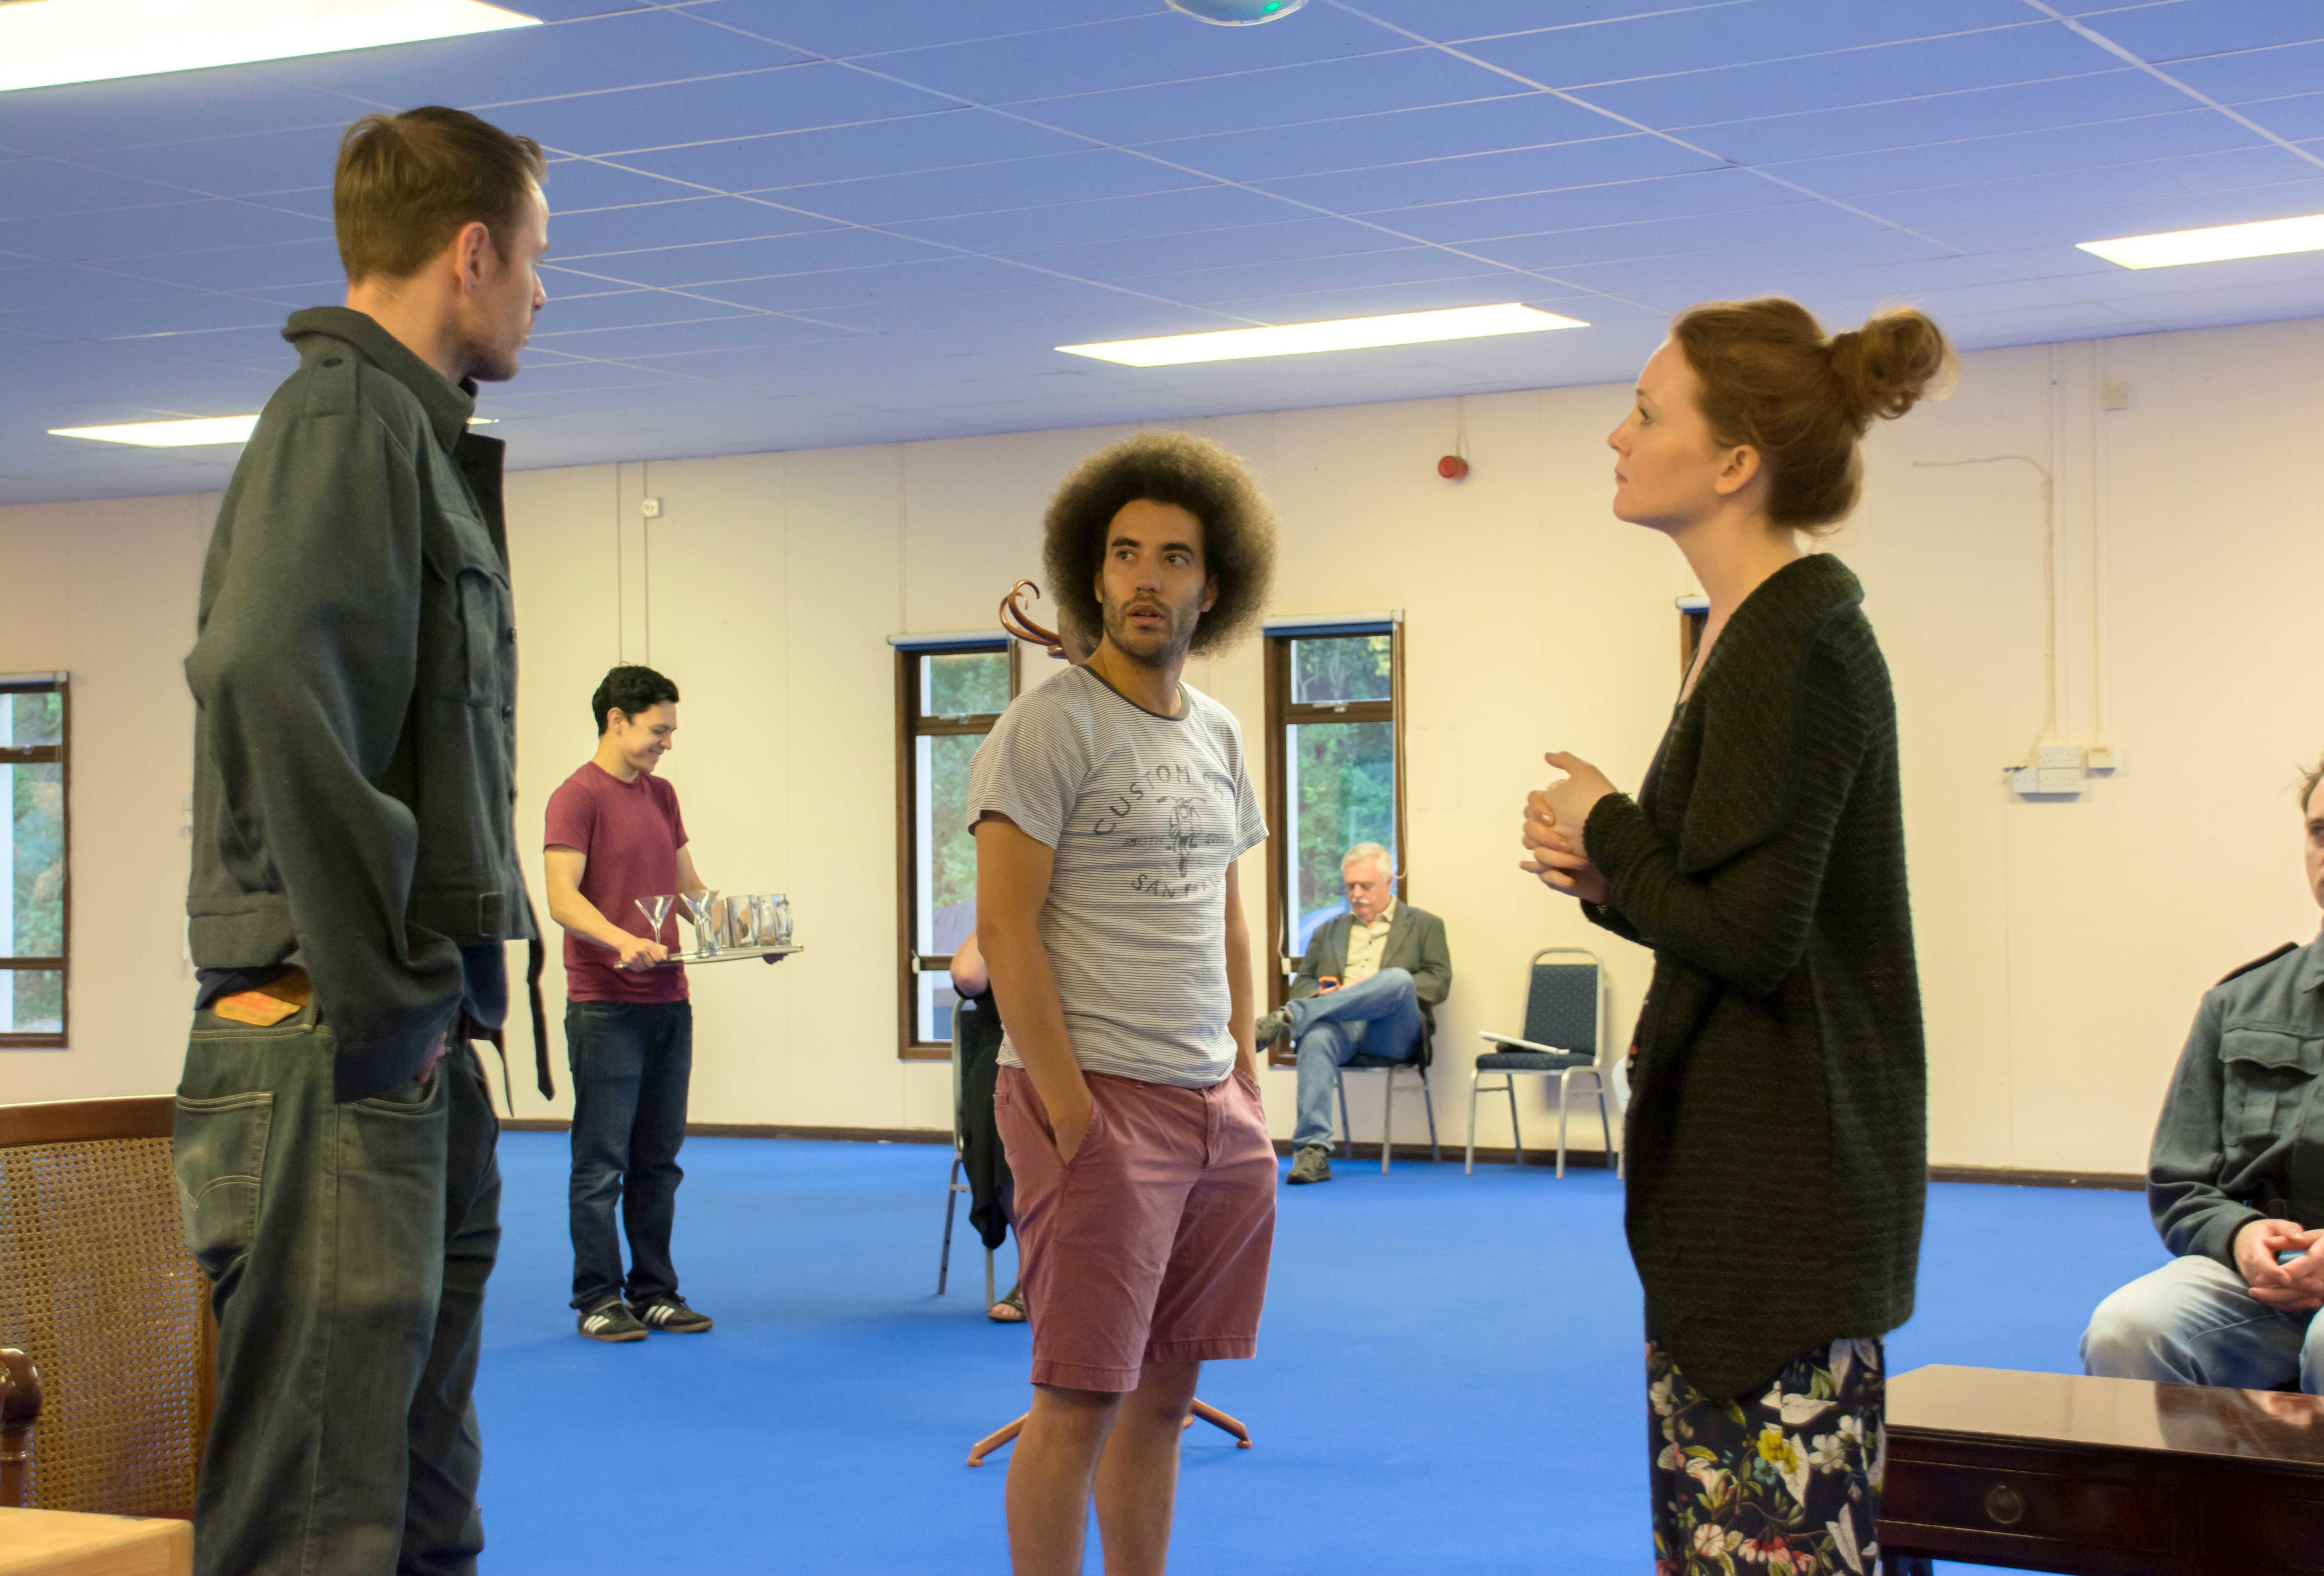 Simon Darwen, Justin Audibert and Olivia Hallinan in rehearsal for Flare Path